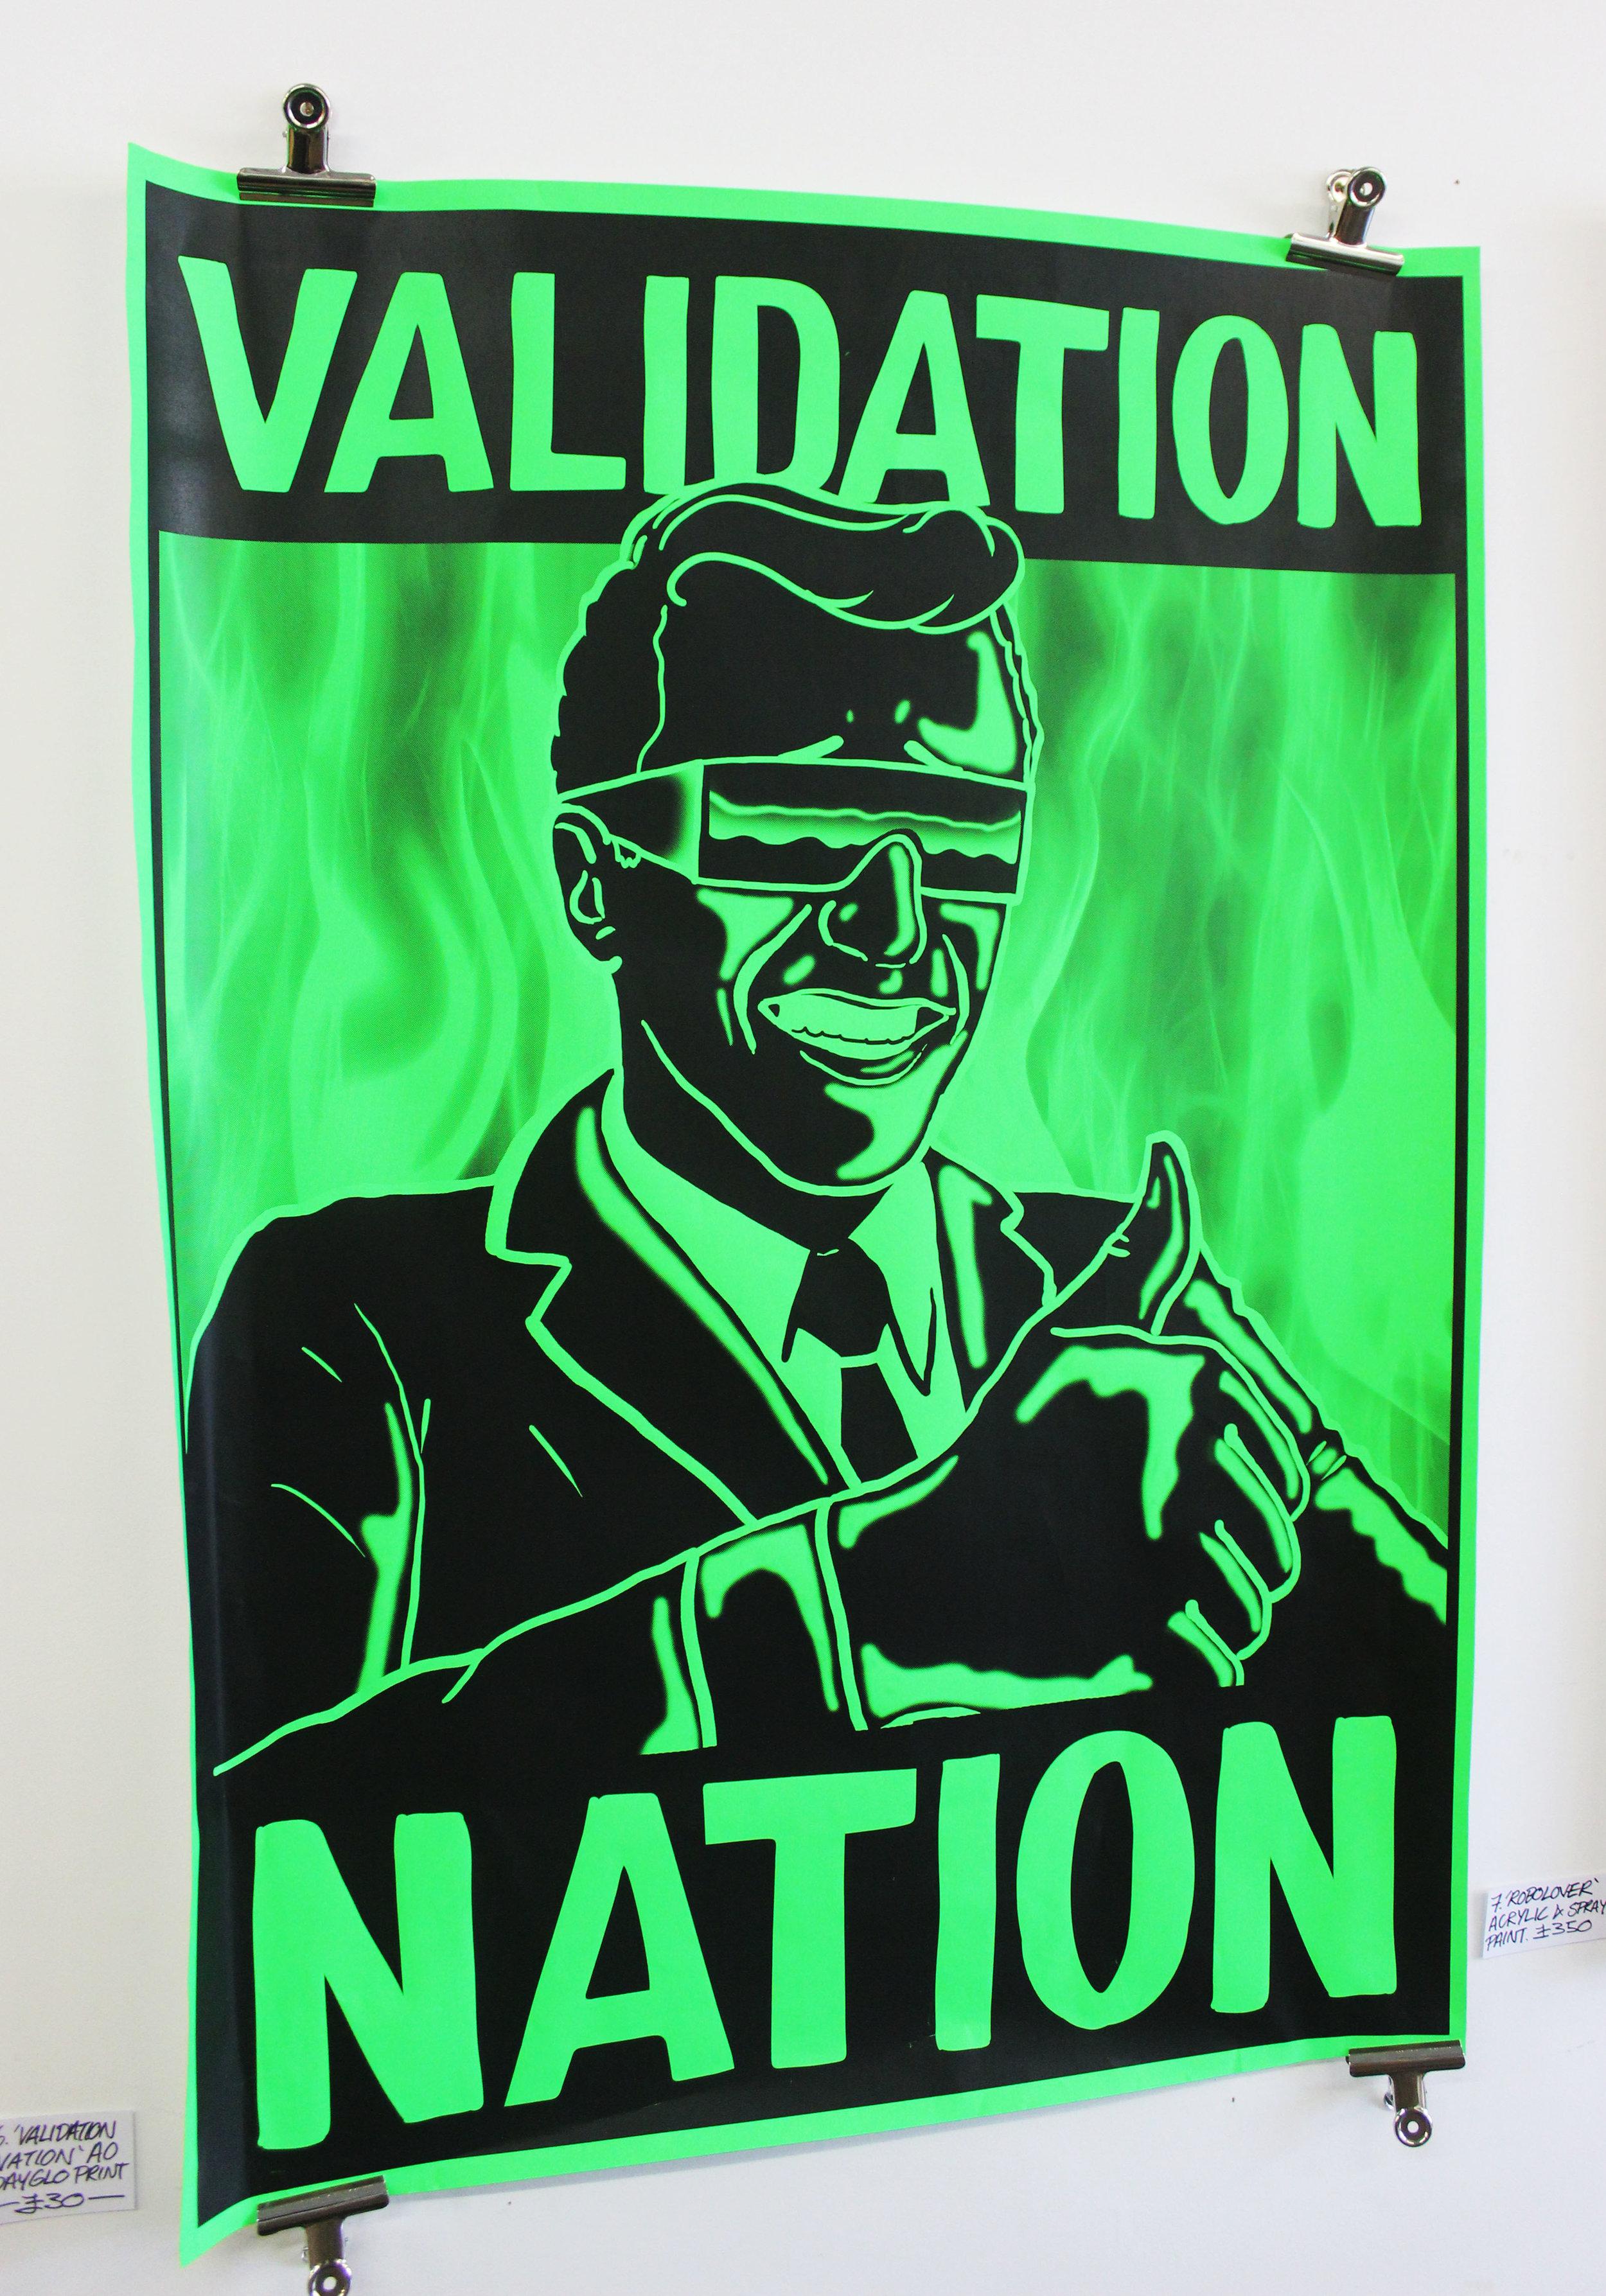 VALIDATION NATION ALLEYKATS ARTWORK POSTER GRAPHIC GREG AK.jpg